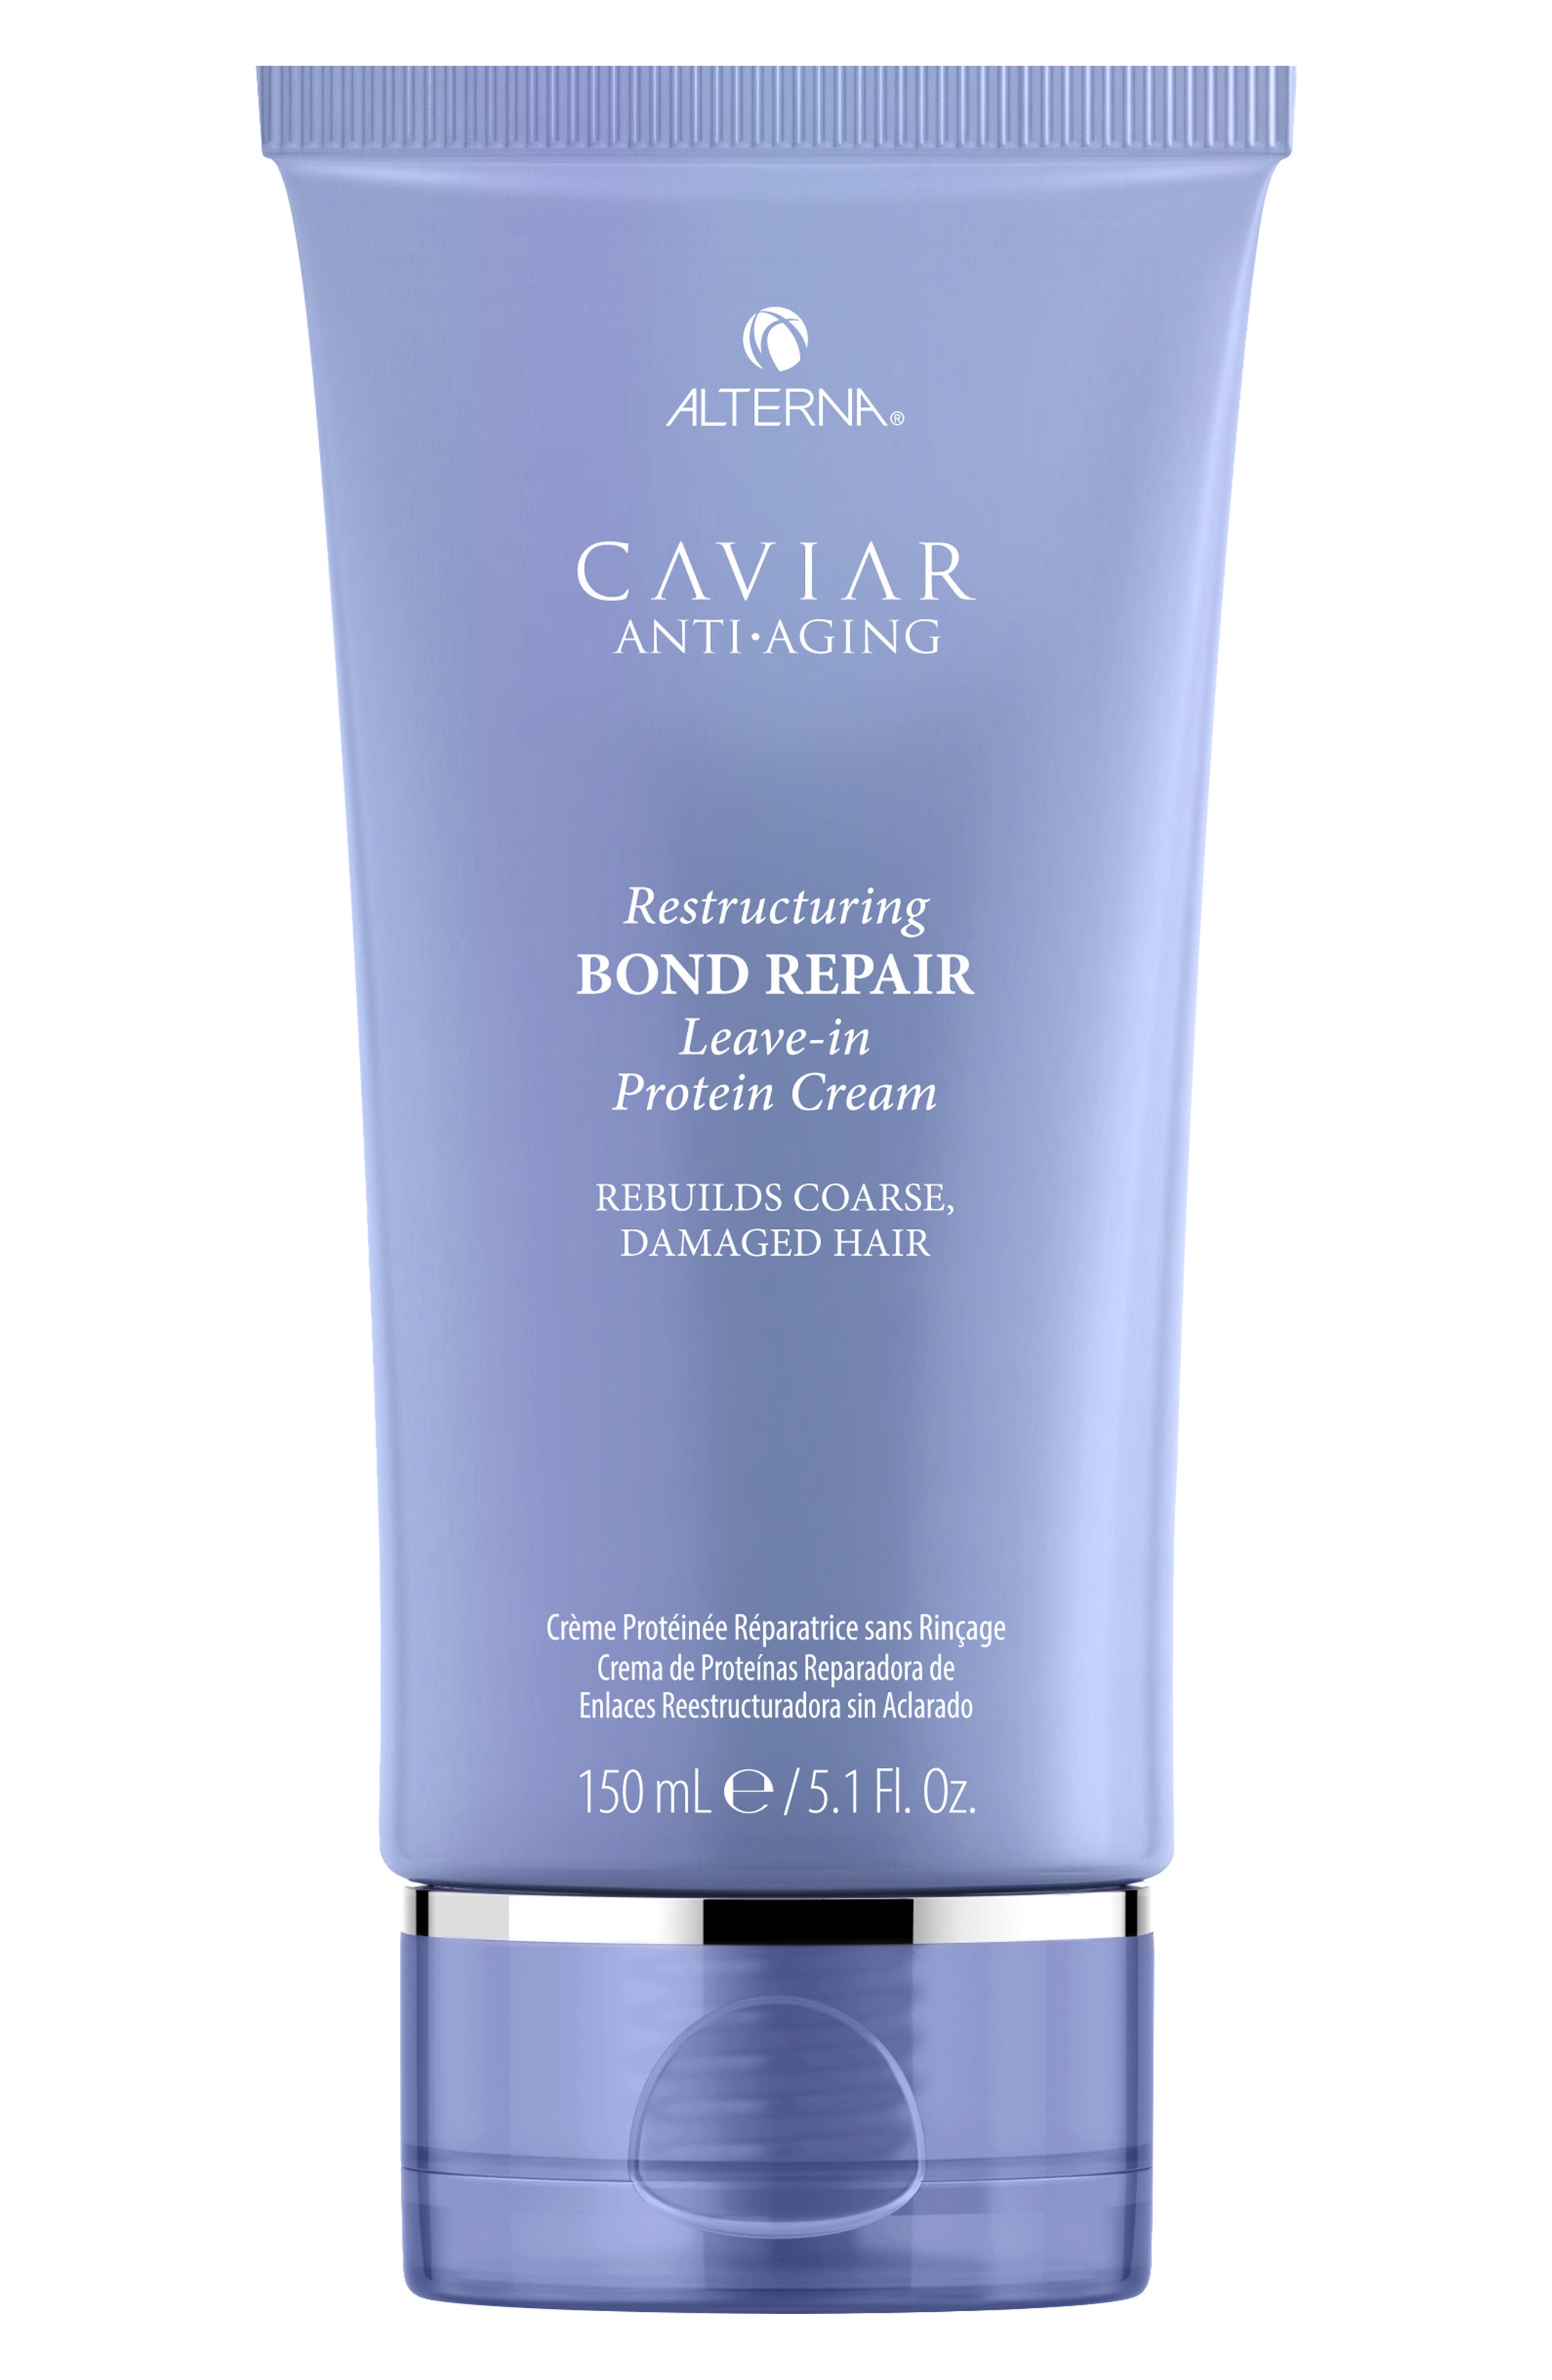 Alterna Caviar Anti-Aging Resturcuring Bond Repair Leave-In Protein Cream, Size 5.1 oz